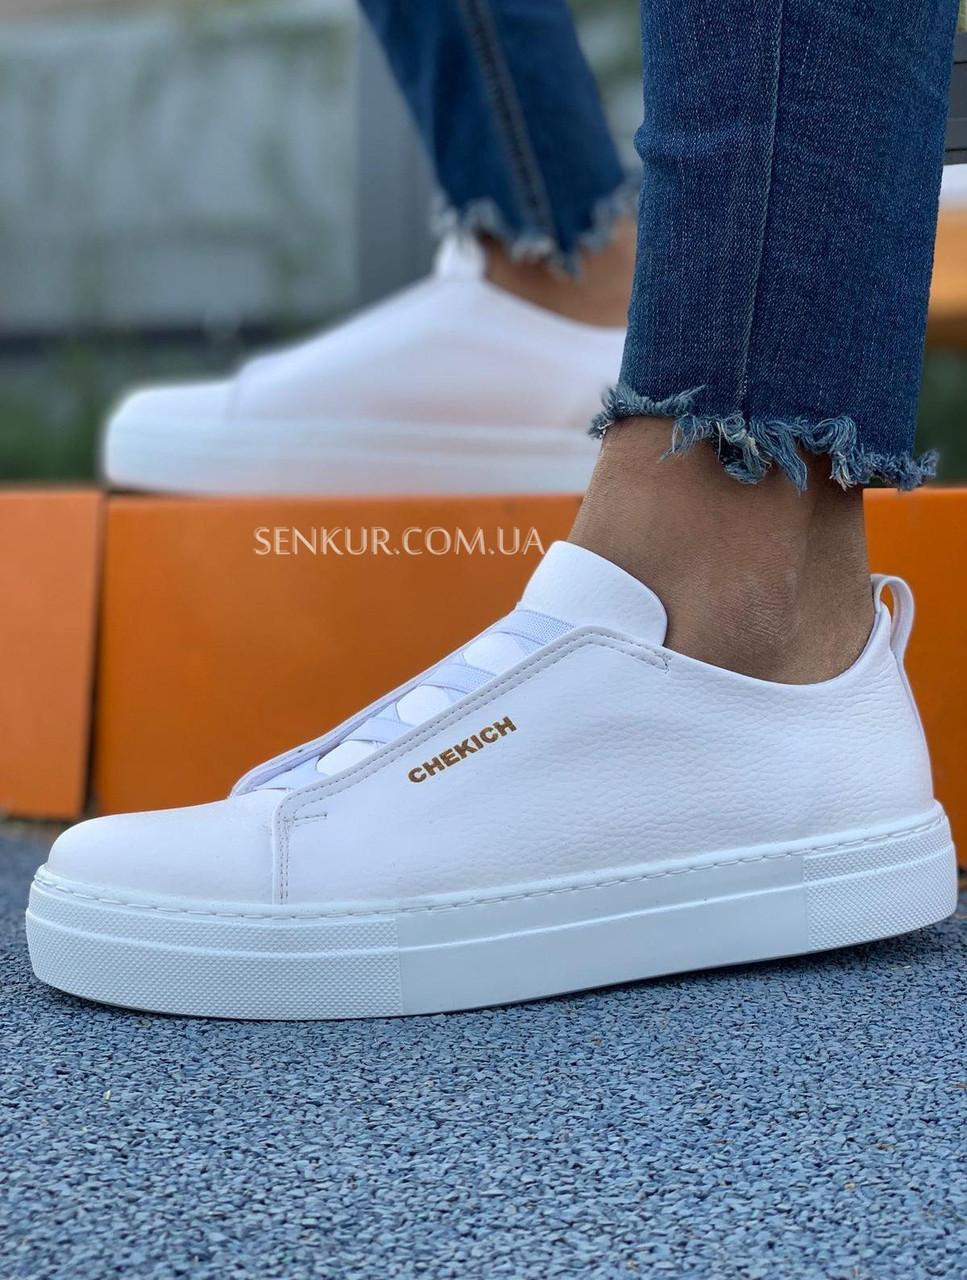 Чоловічі кросівки Chekich CH013 White